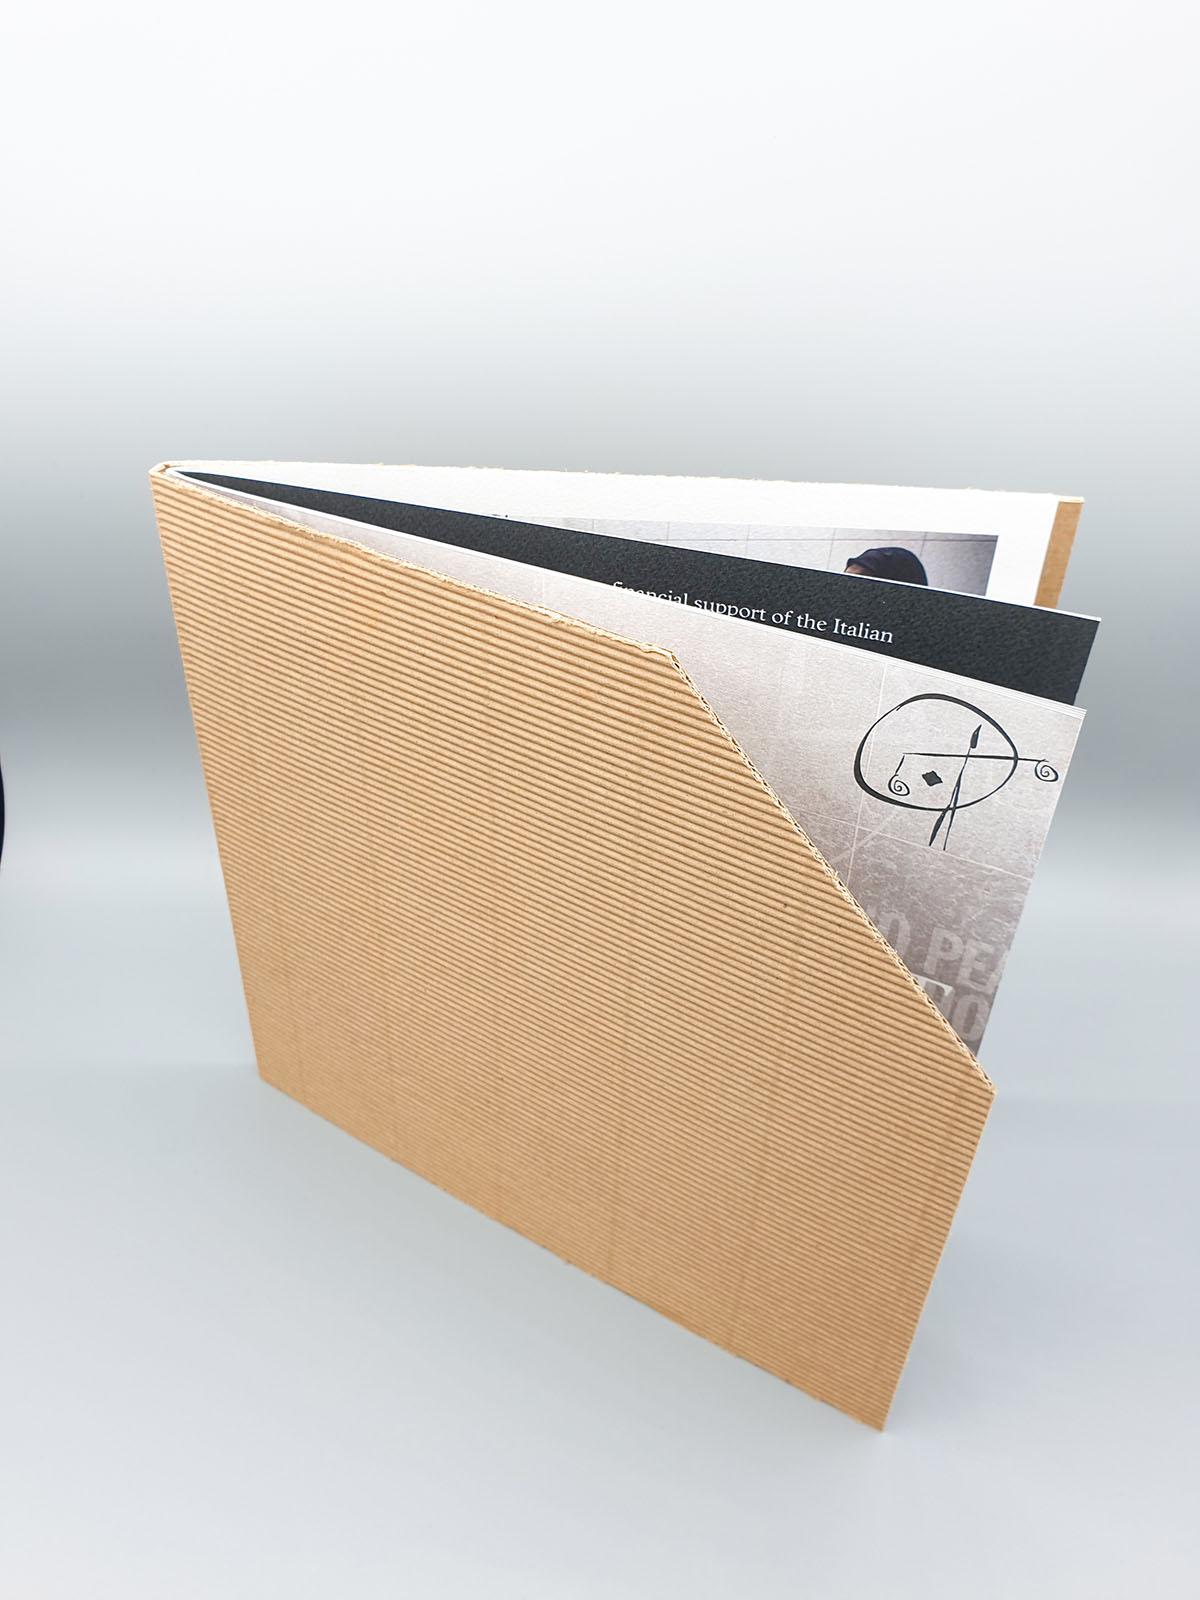 Volume brossura e punto metallico - Page Service - pageservice.it